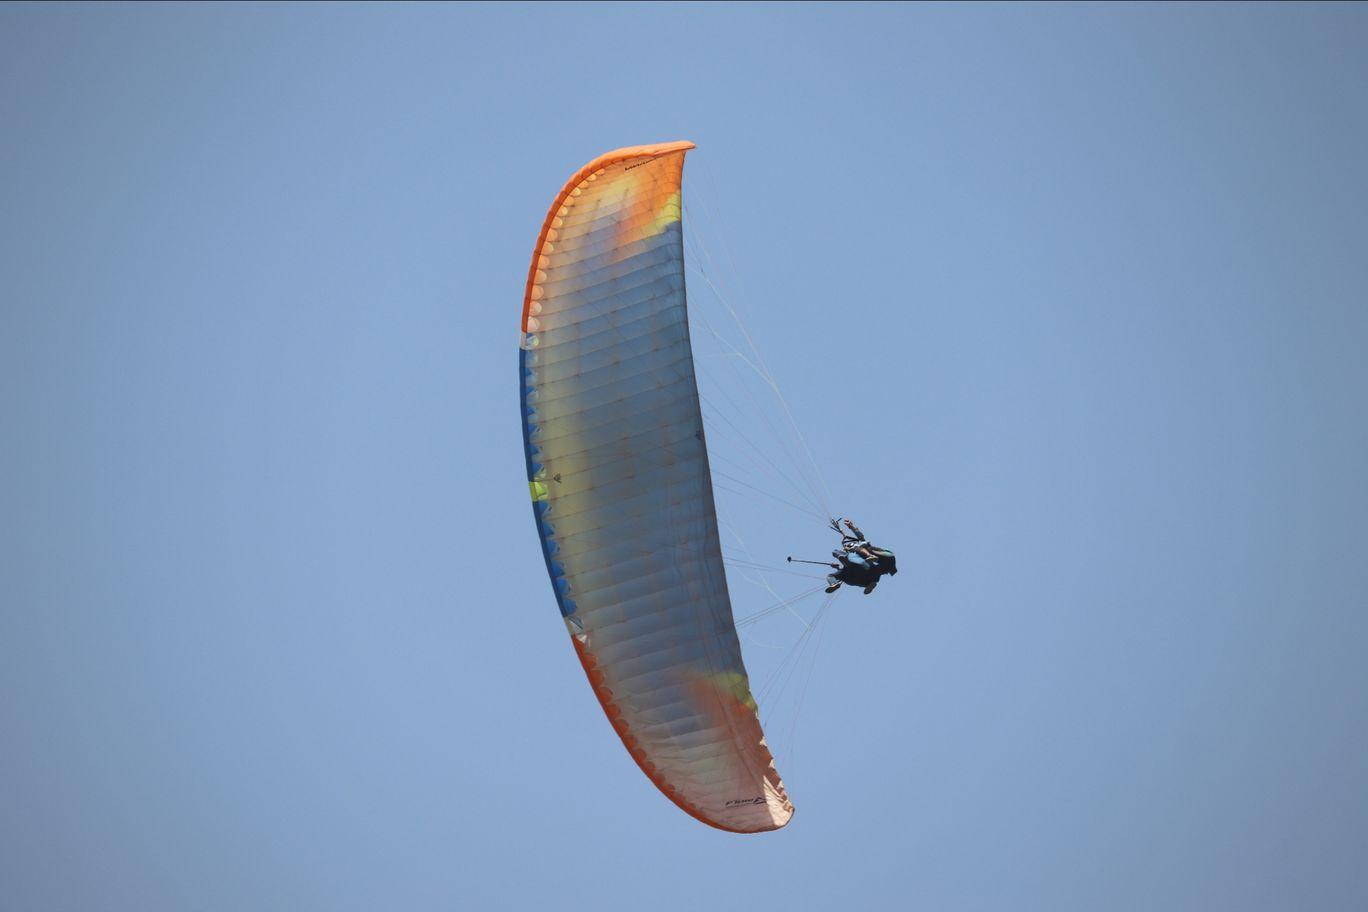 Photo of Bir Billing Paragliding By Deepak Munjal